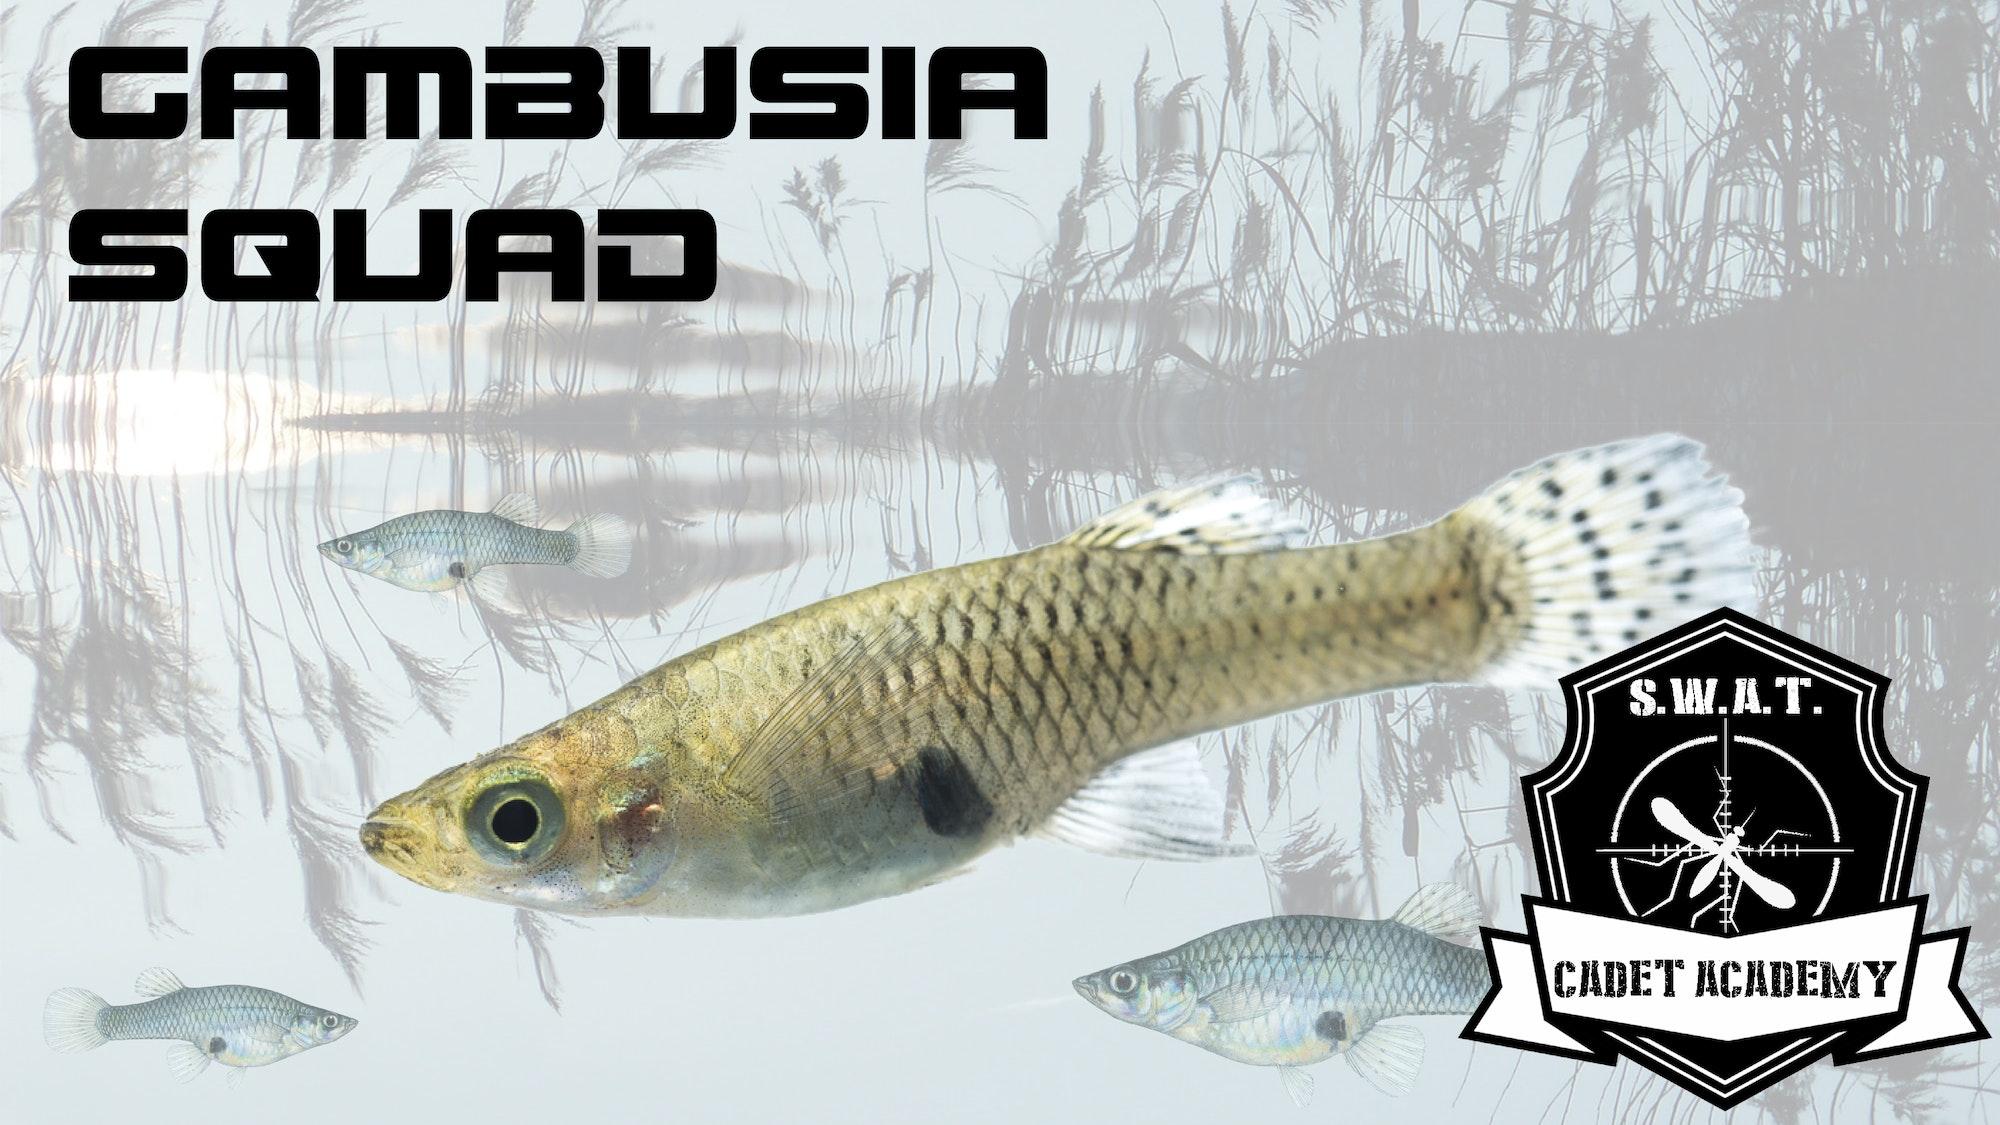 May contain: fish and animal